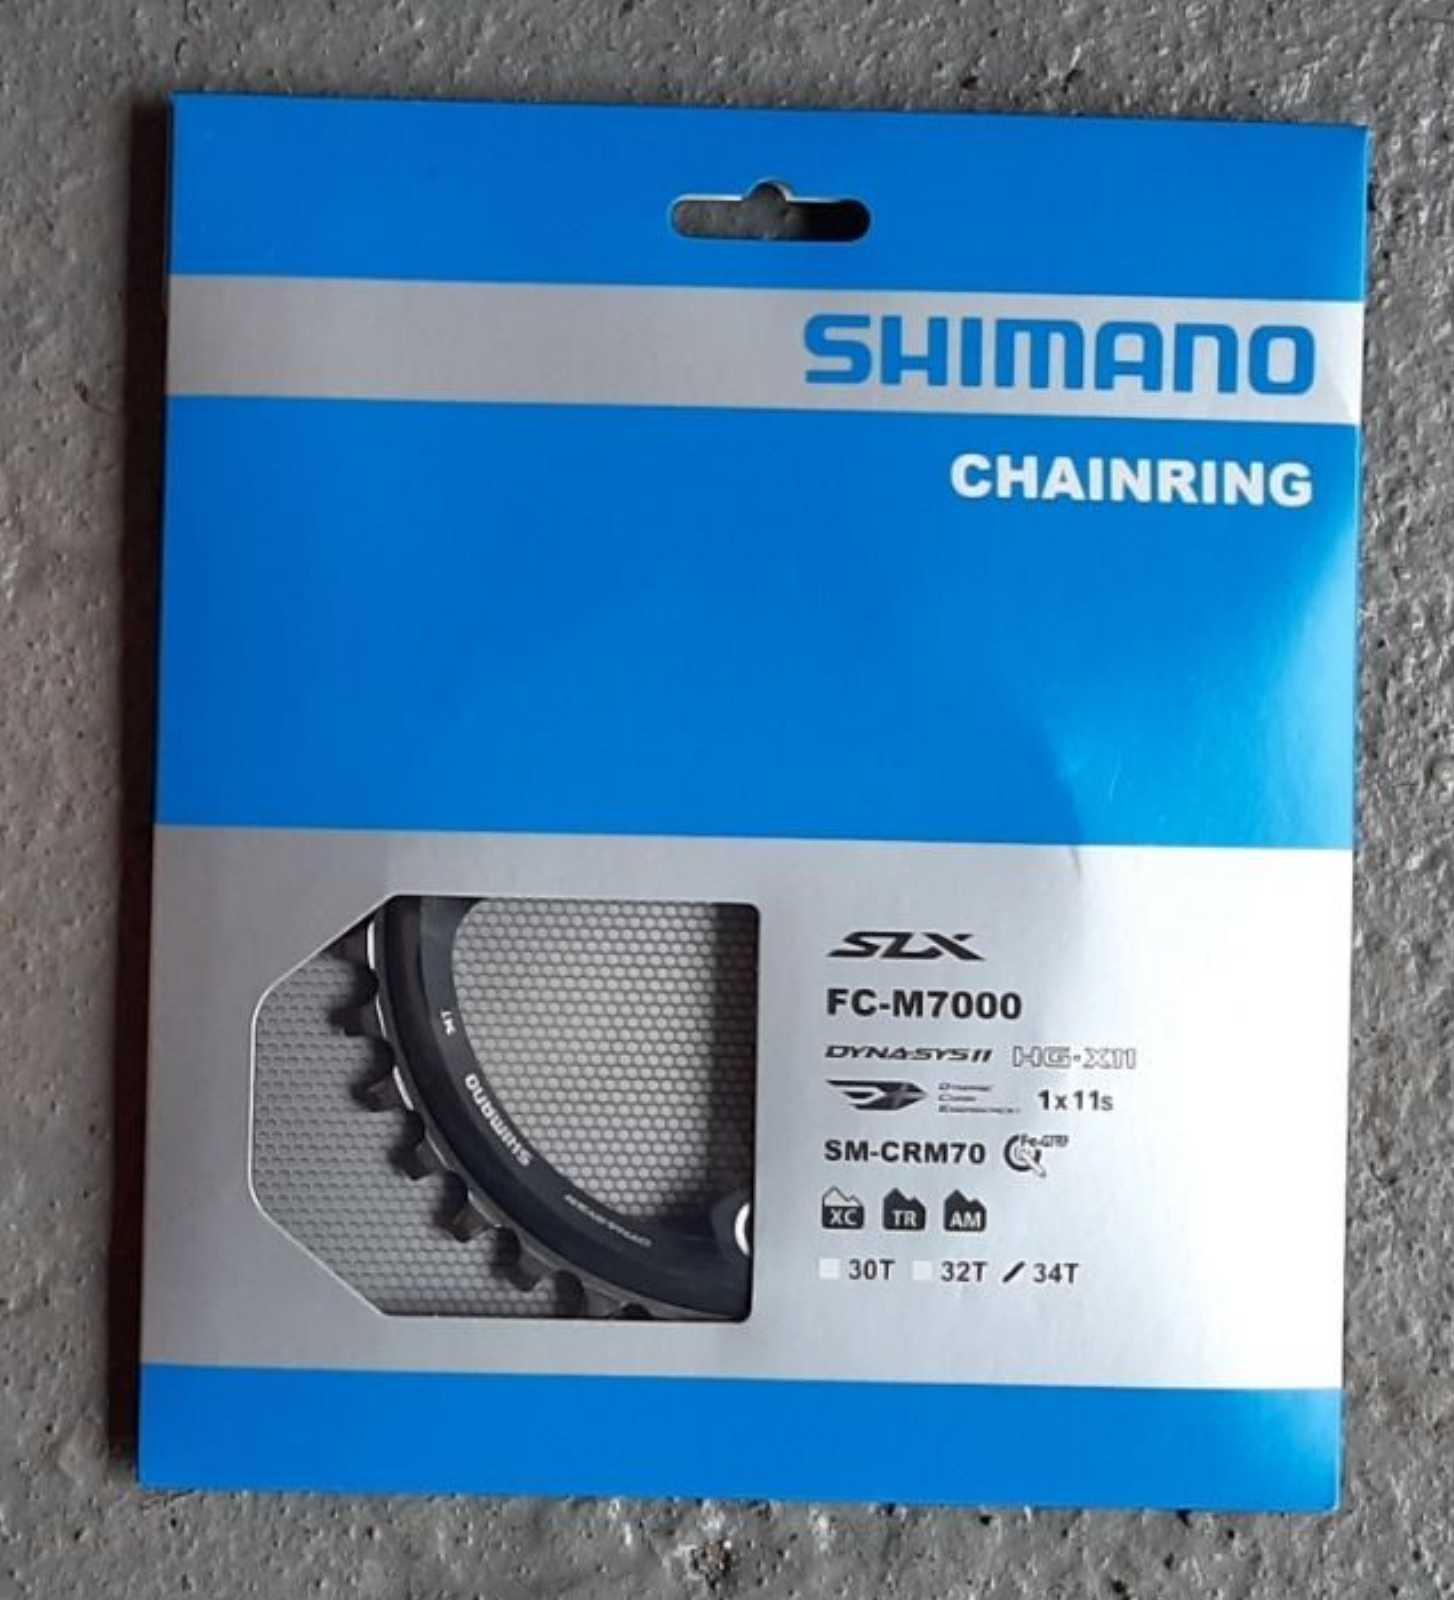 Звезда 34Т SHIMANO FC-M7000